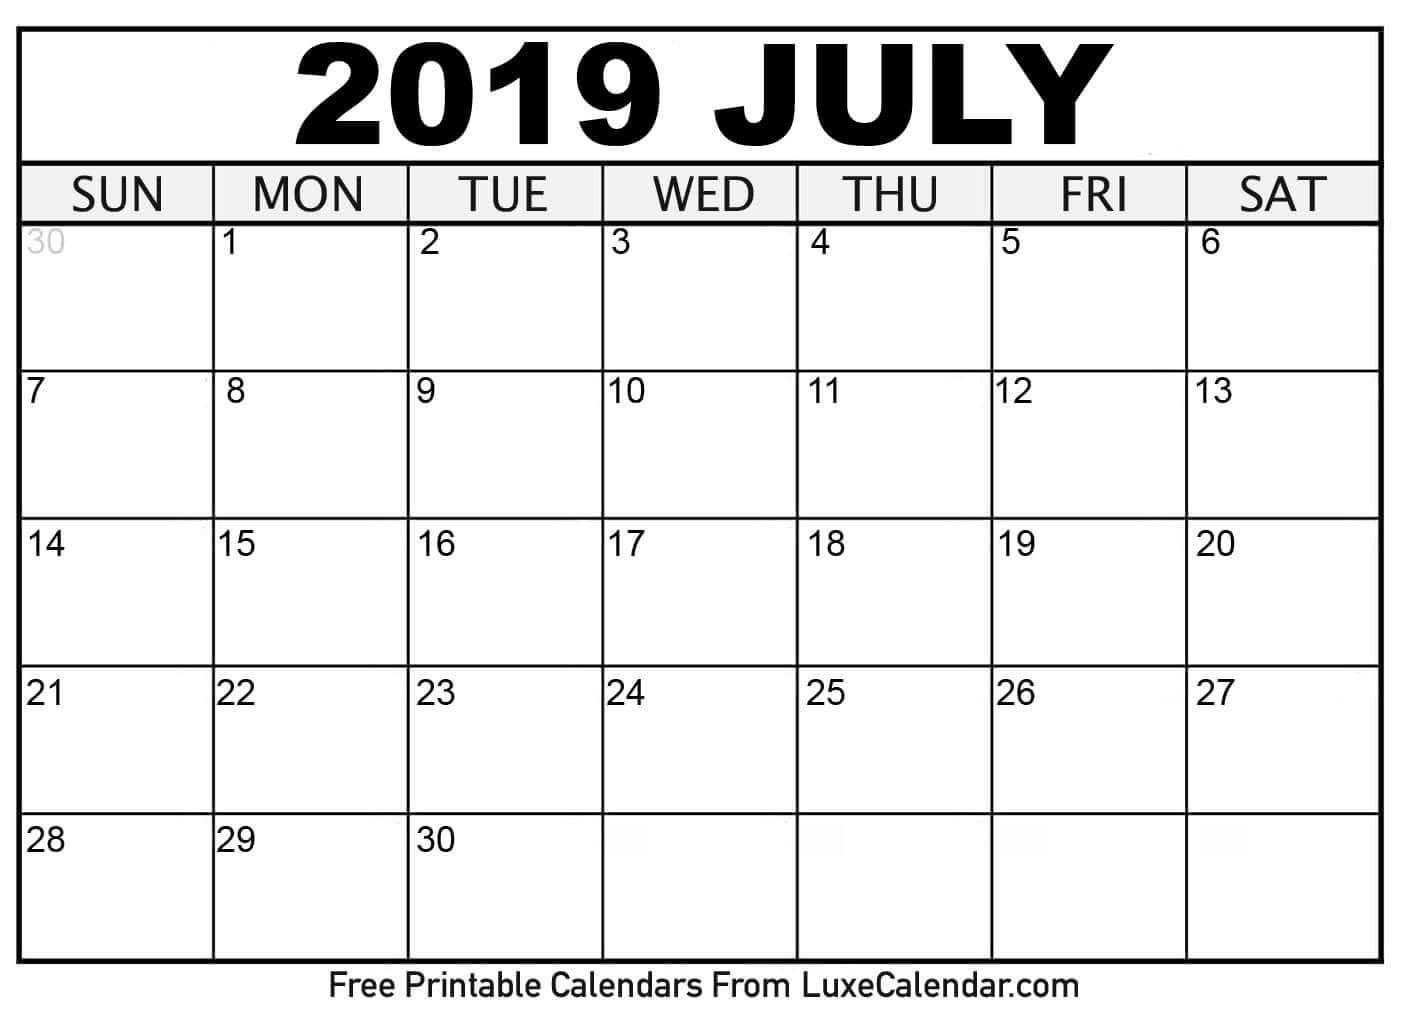 Calendar Free Printable 2019 Blank July 2019 Printable Calendar Luxe regarding Free 8/2019 -5/ 2020 Printable Calendar